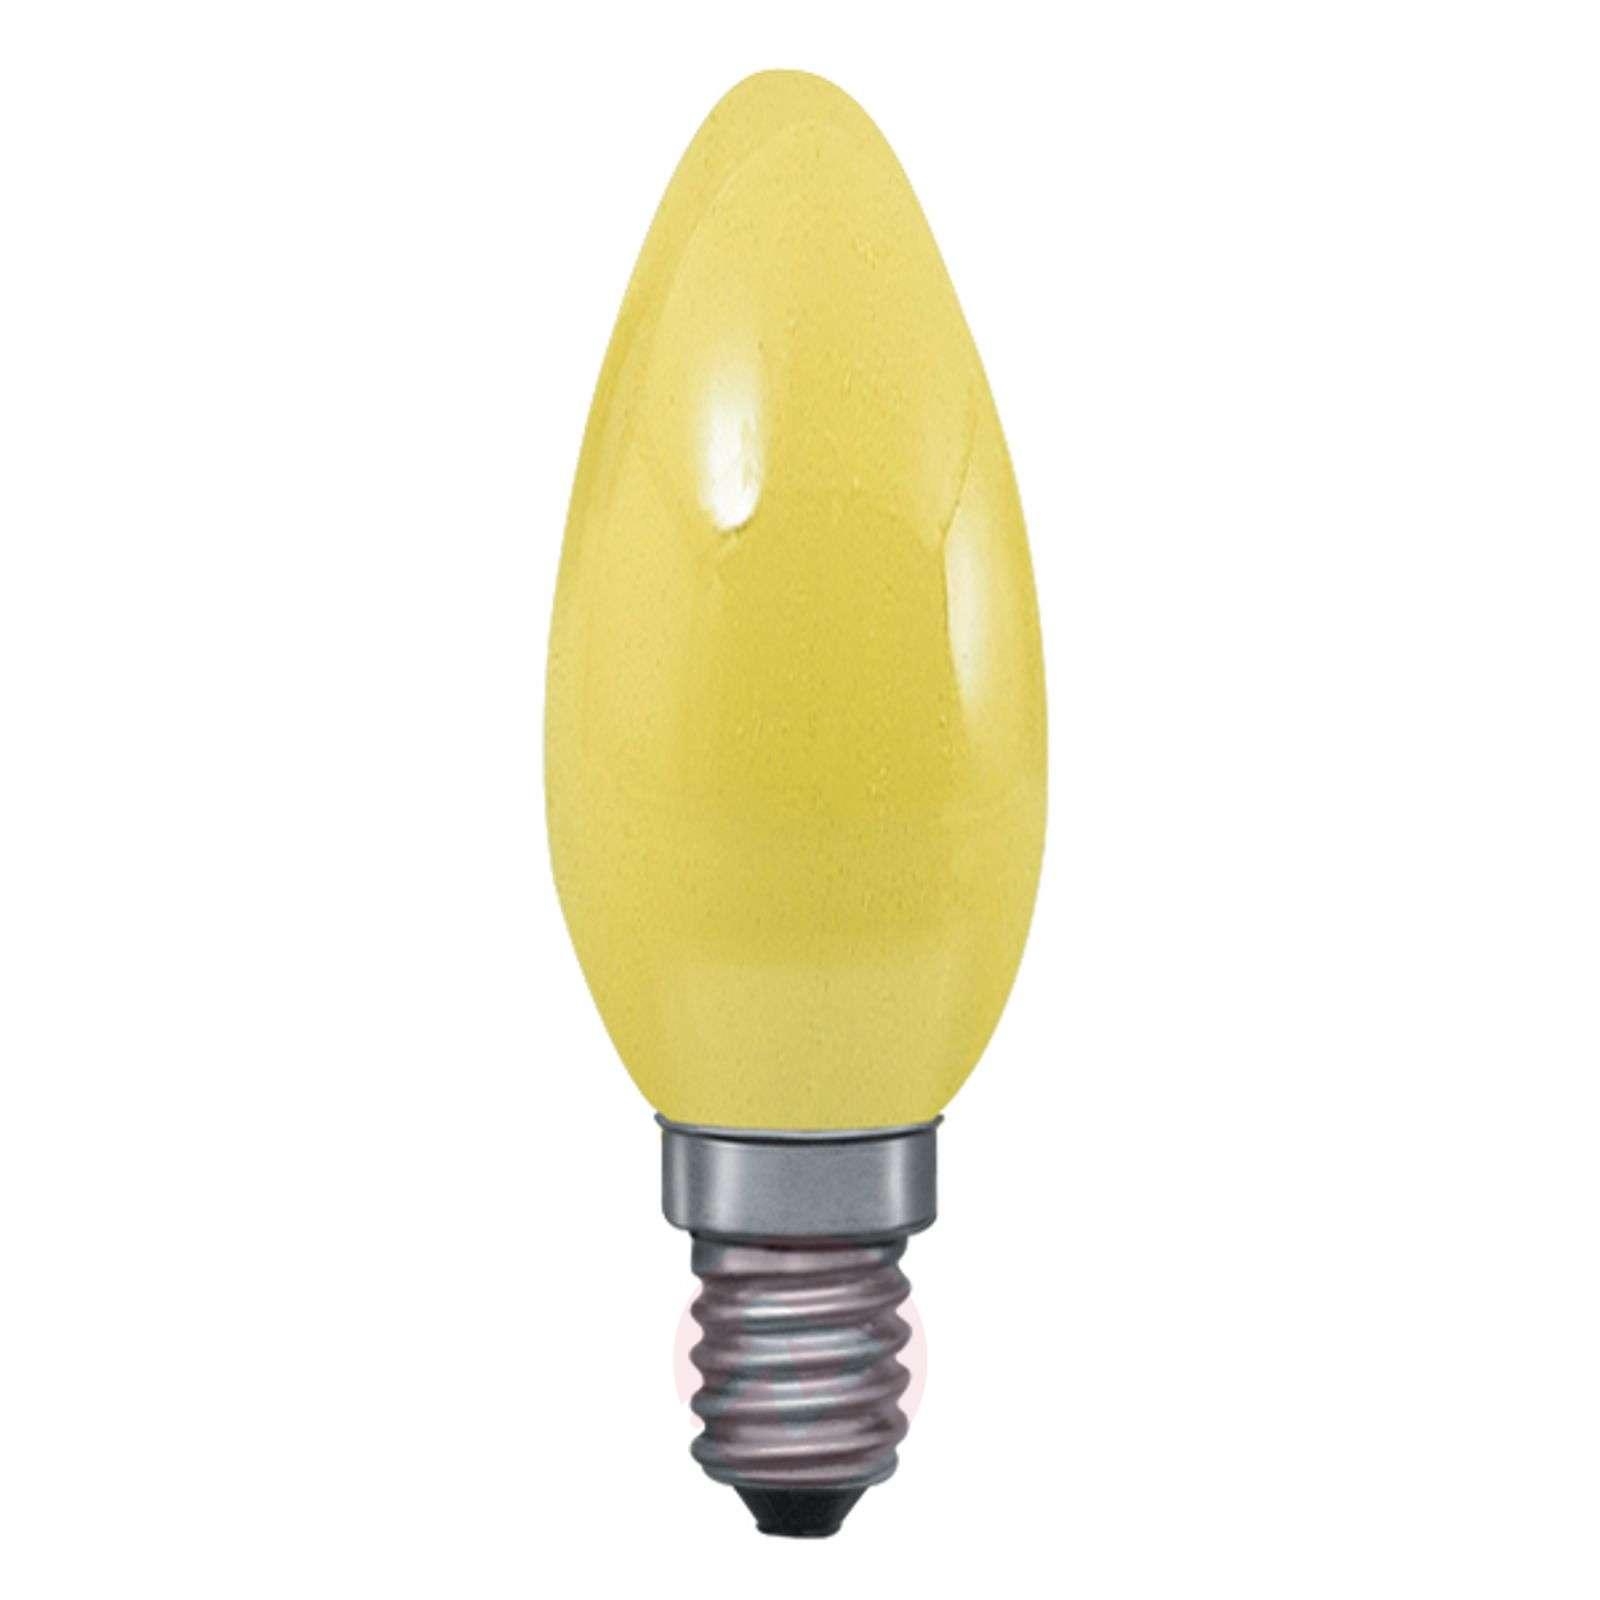 E14 25W kynttilälamppu-7601016X-01